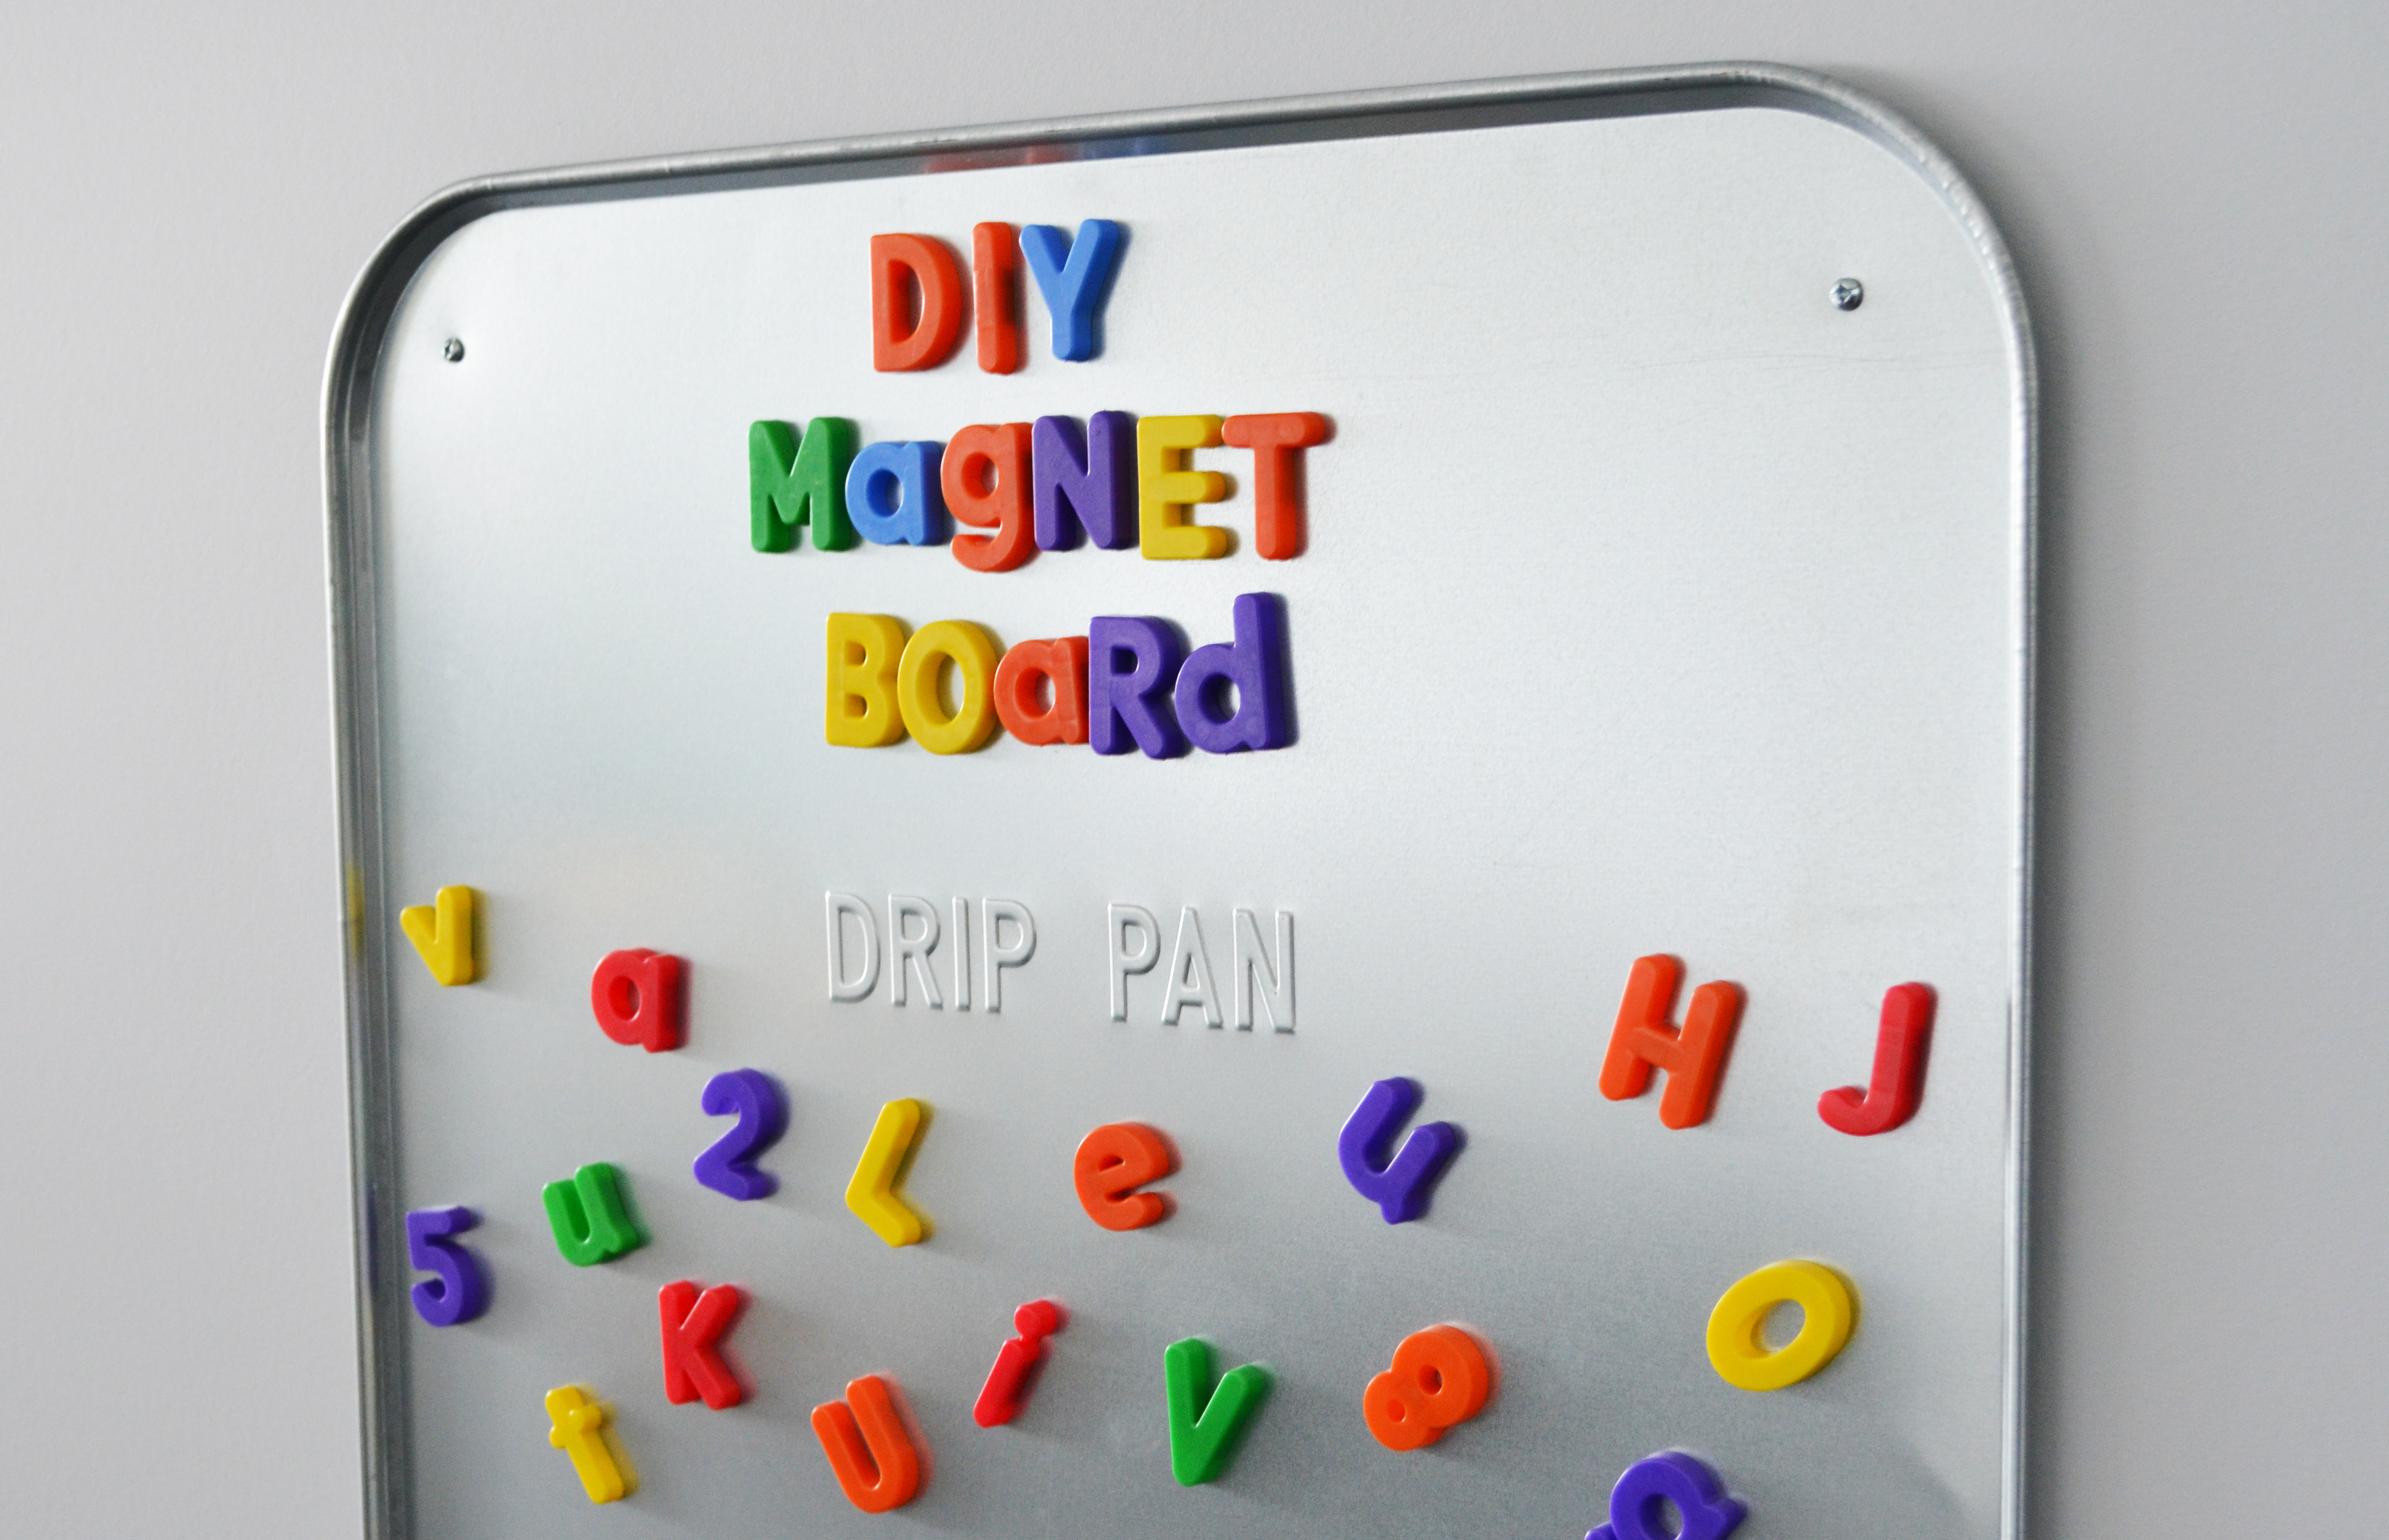 Magnet For Car >> DIY Magnet Board - Whisking Mama